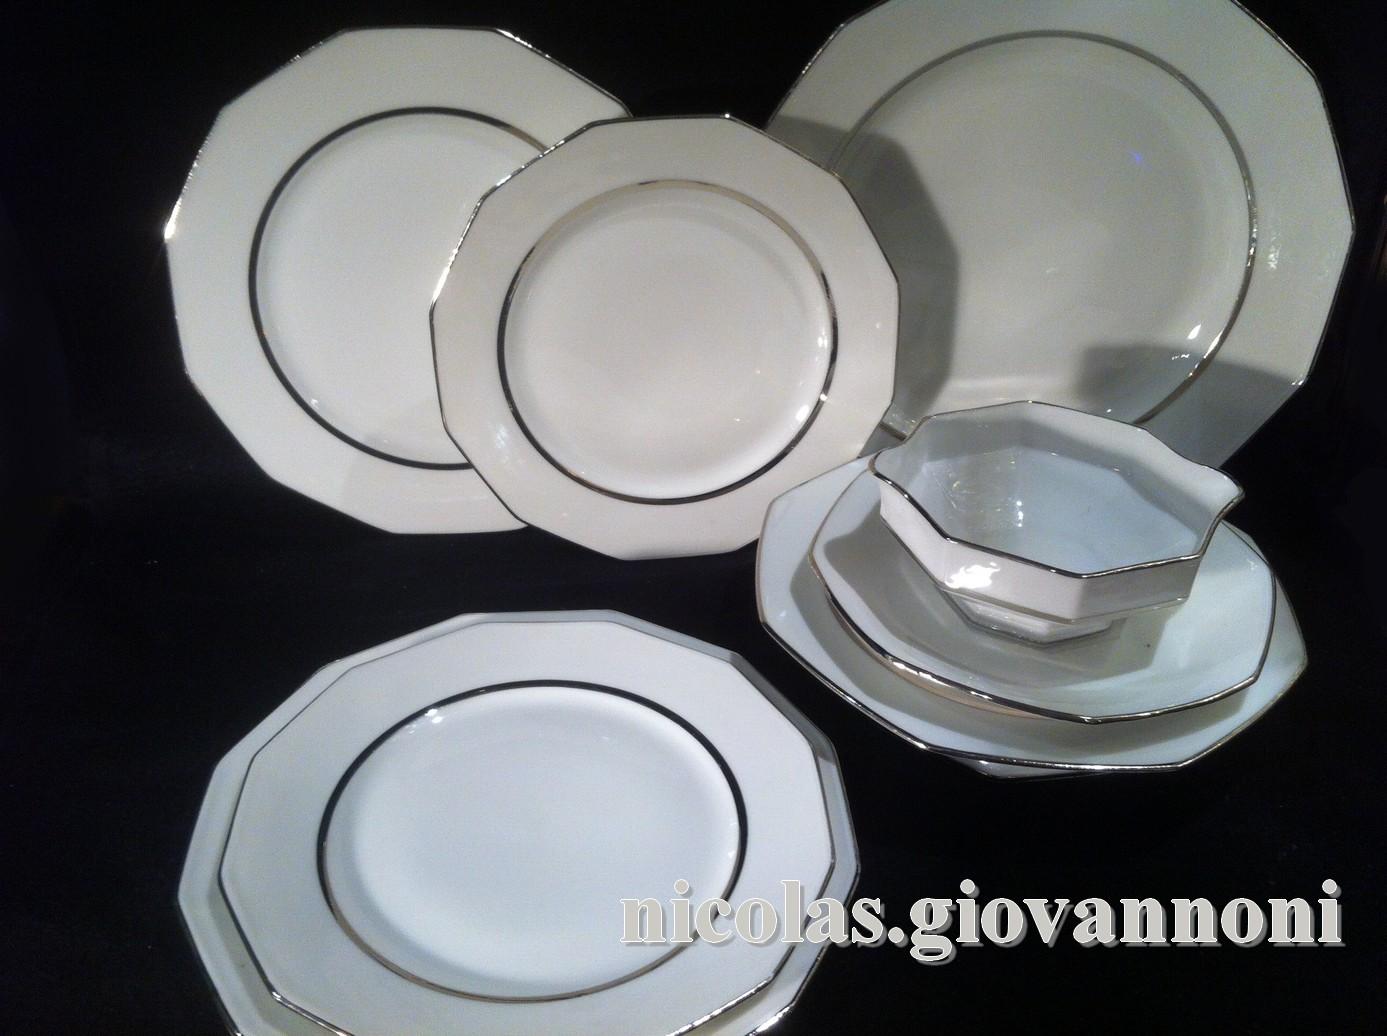 service 64 pi ces filet platine legrand limoges porcelaine catalogue cristal de. Black Bedroom Furniture Sets. Home Design Ideas